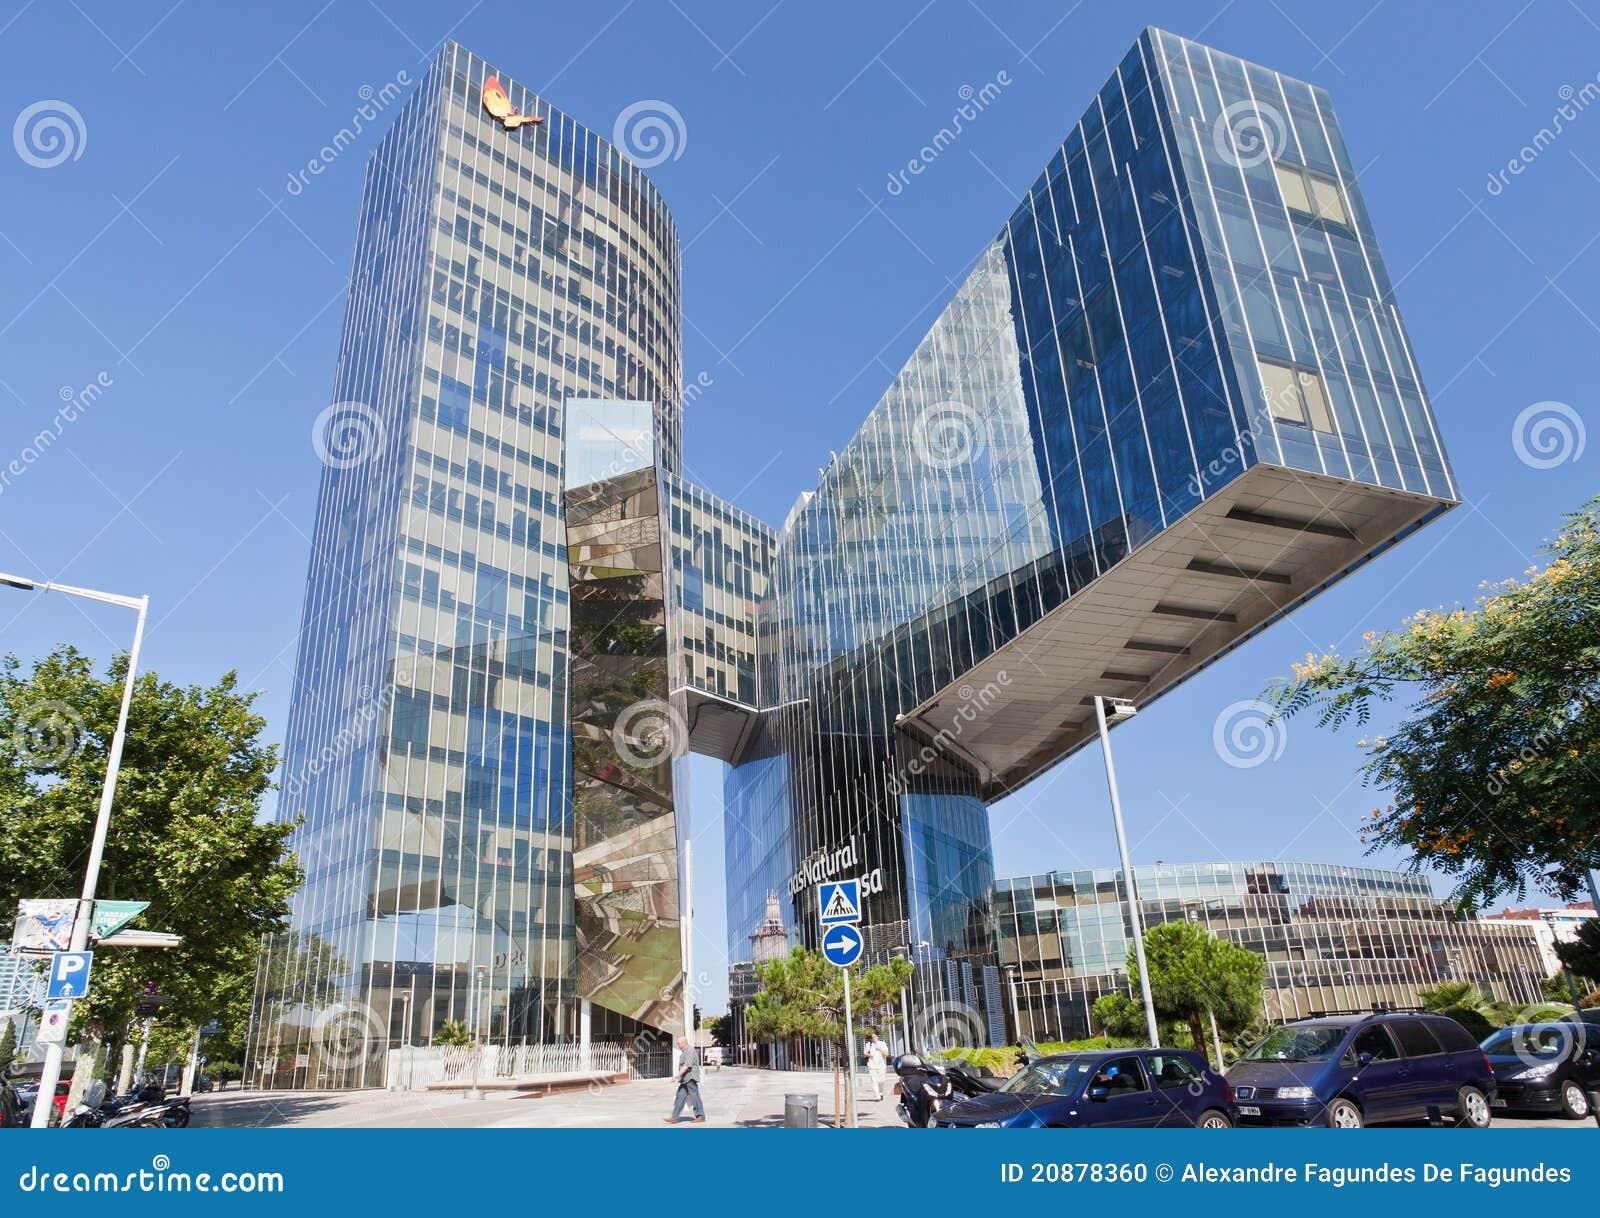 enric miralles time architecture Clichy montfermeil grand paris express, paris in paris has been announced as barcelona based architects enric miralles / benedetta play-time architectonic.